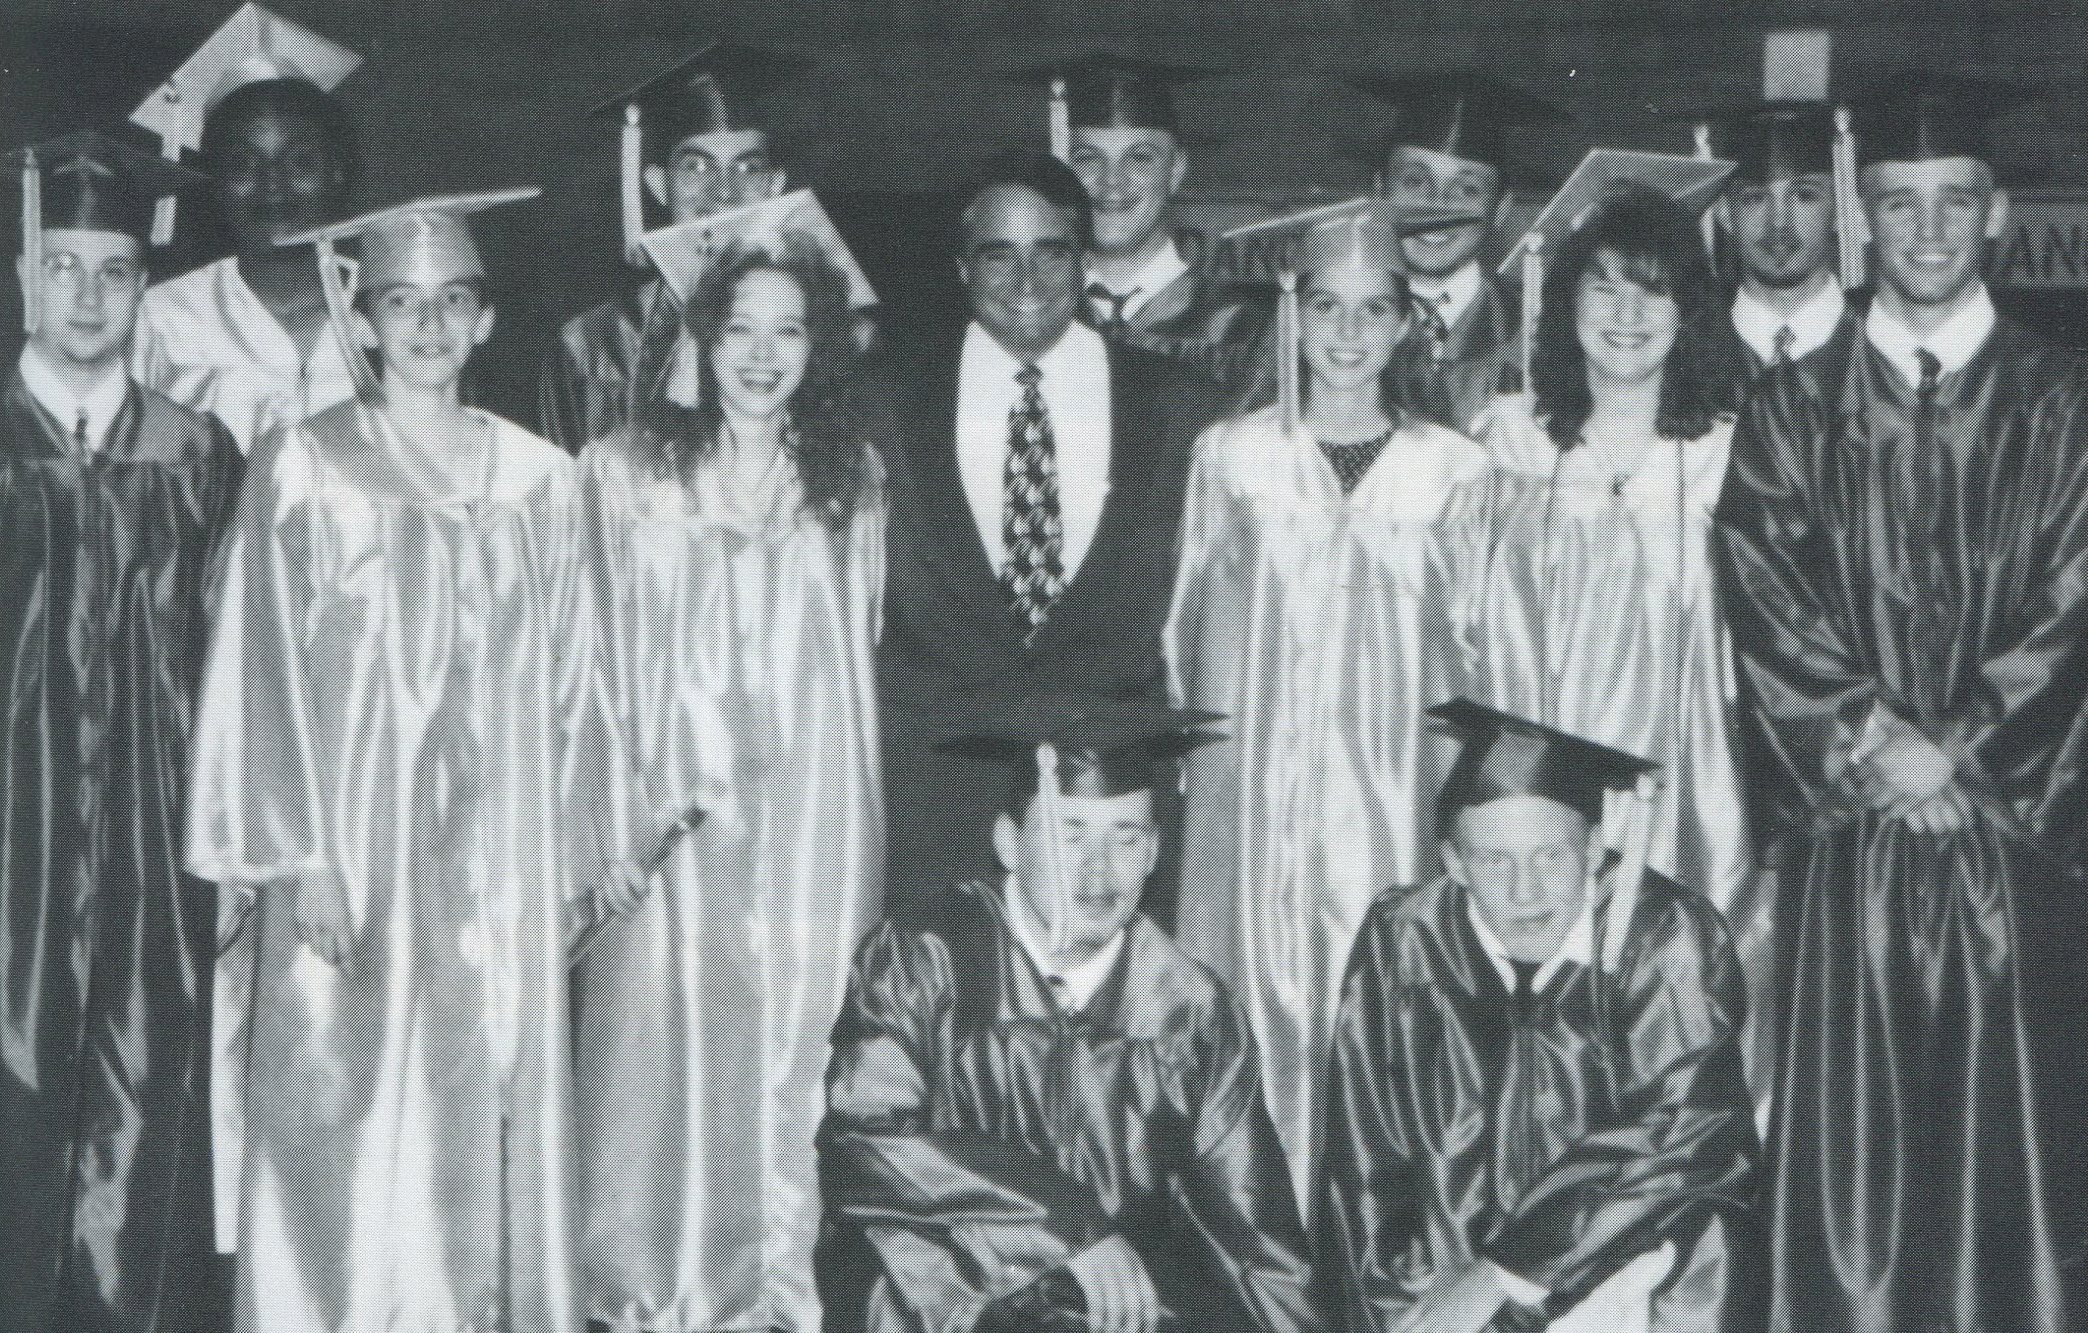 1997 yearbook photo